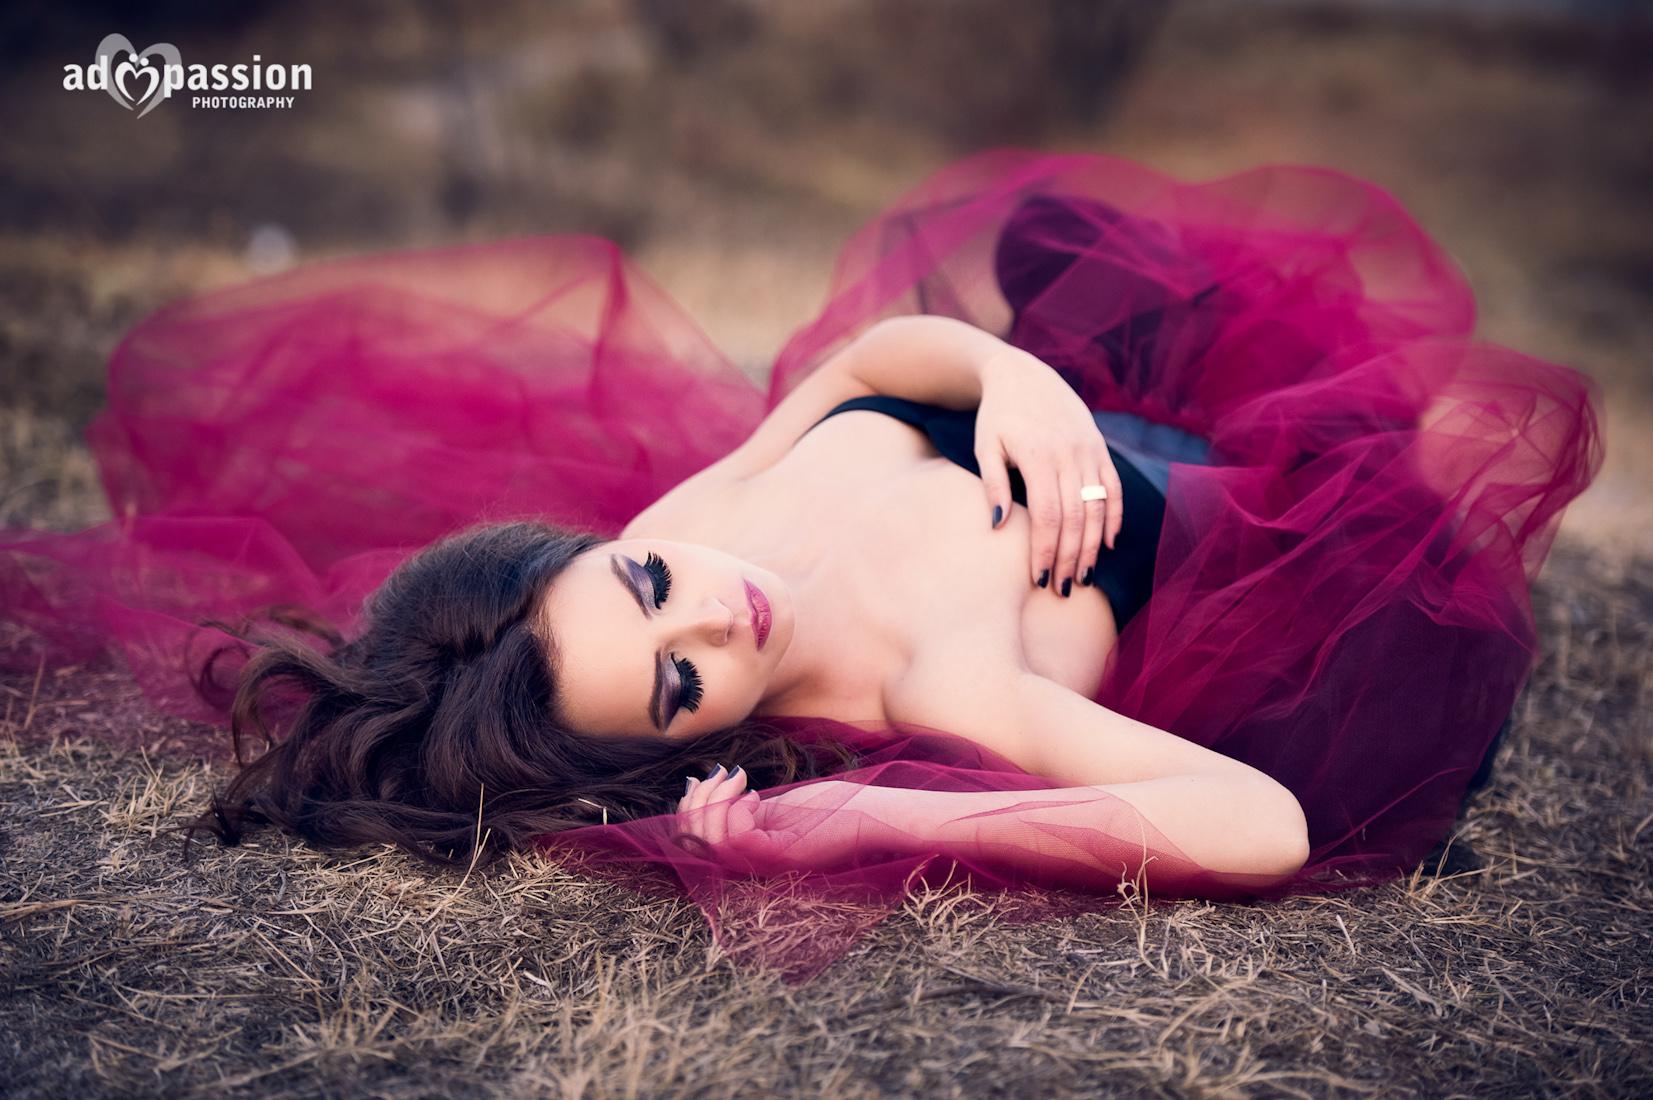 AD Passion Photography | alexandra_castelul_huniazilor_002 | Adelin, Dida, fotograf profesionist, fotograf de nunta, fotografie de nunta, fotograf Timisoara, fotograf Craiova, fotograf Bucuresti, fotograf Arad, nunta Timisoara, nunta Arad, nunta Bucuresti, nunta Craiova